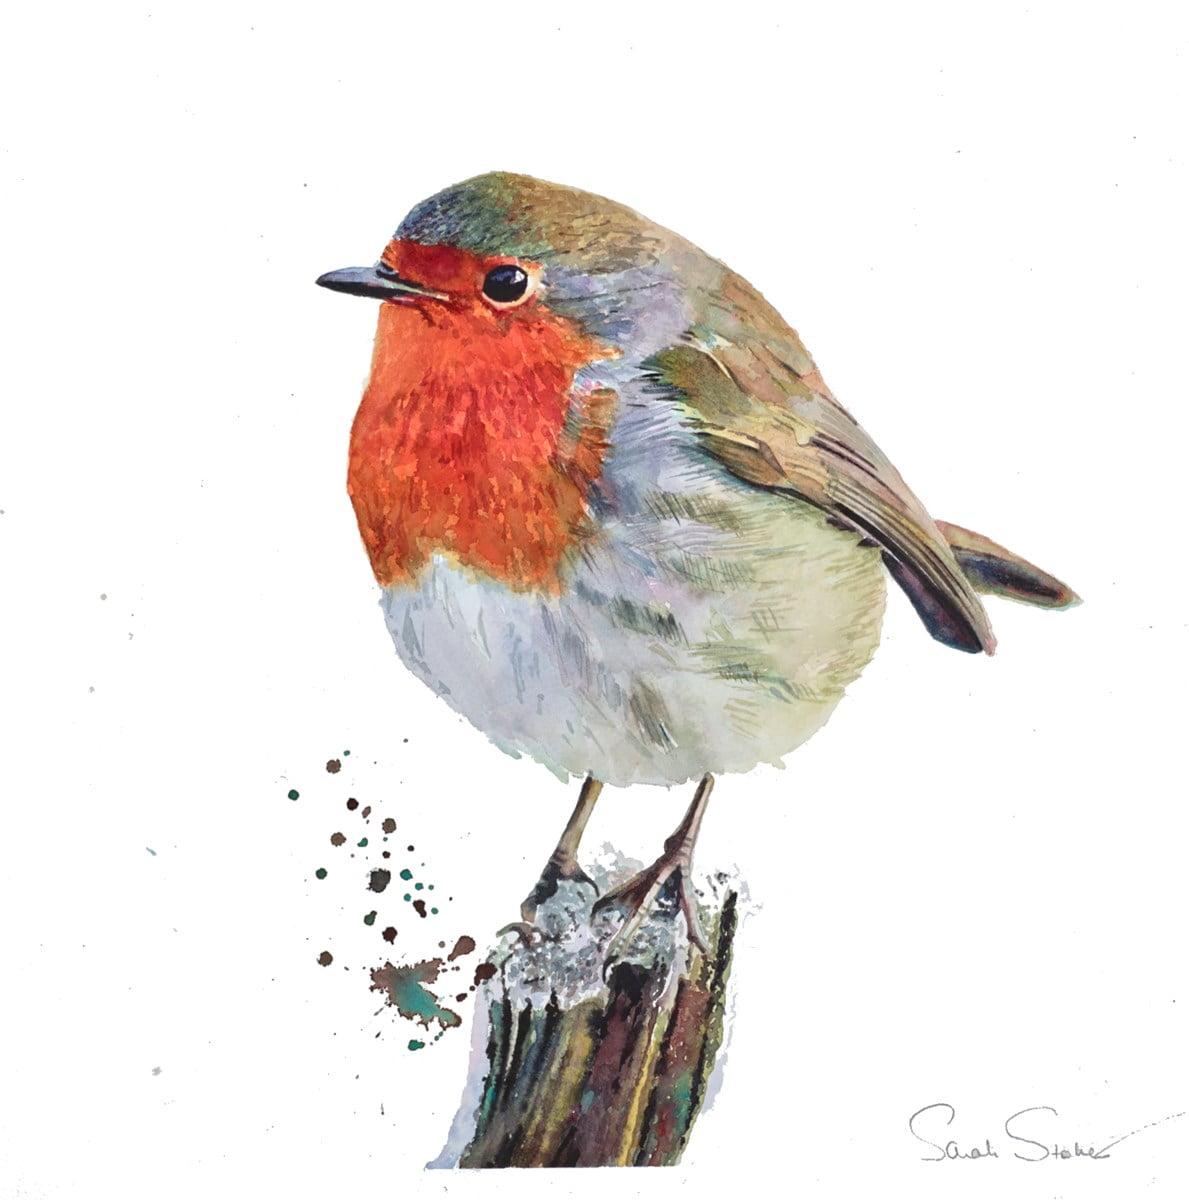 Little Robin Redbreast ~ Sarah Stokes